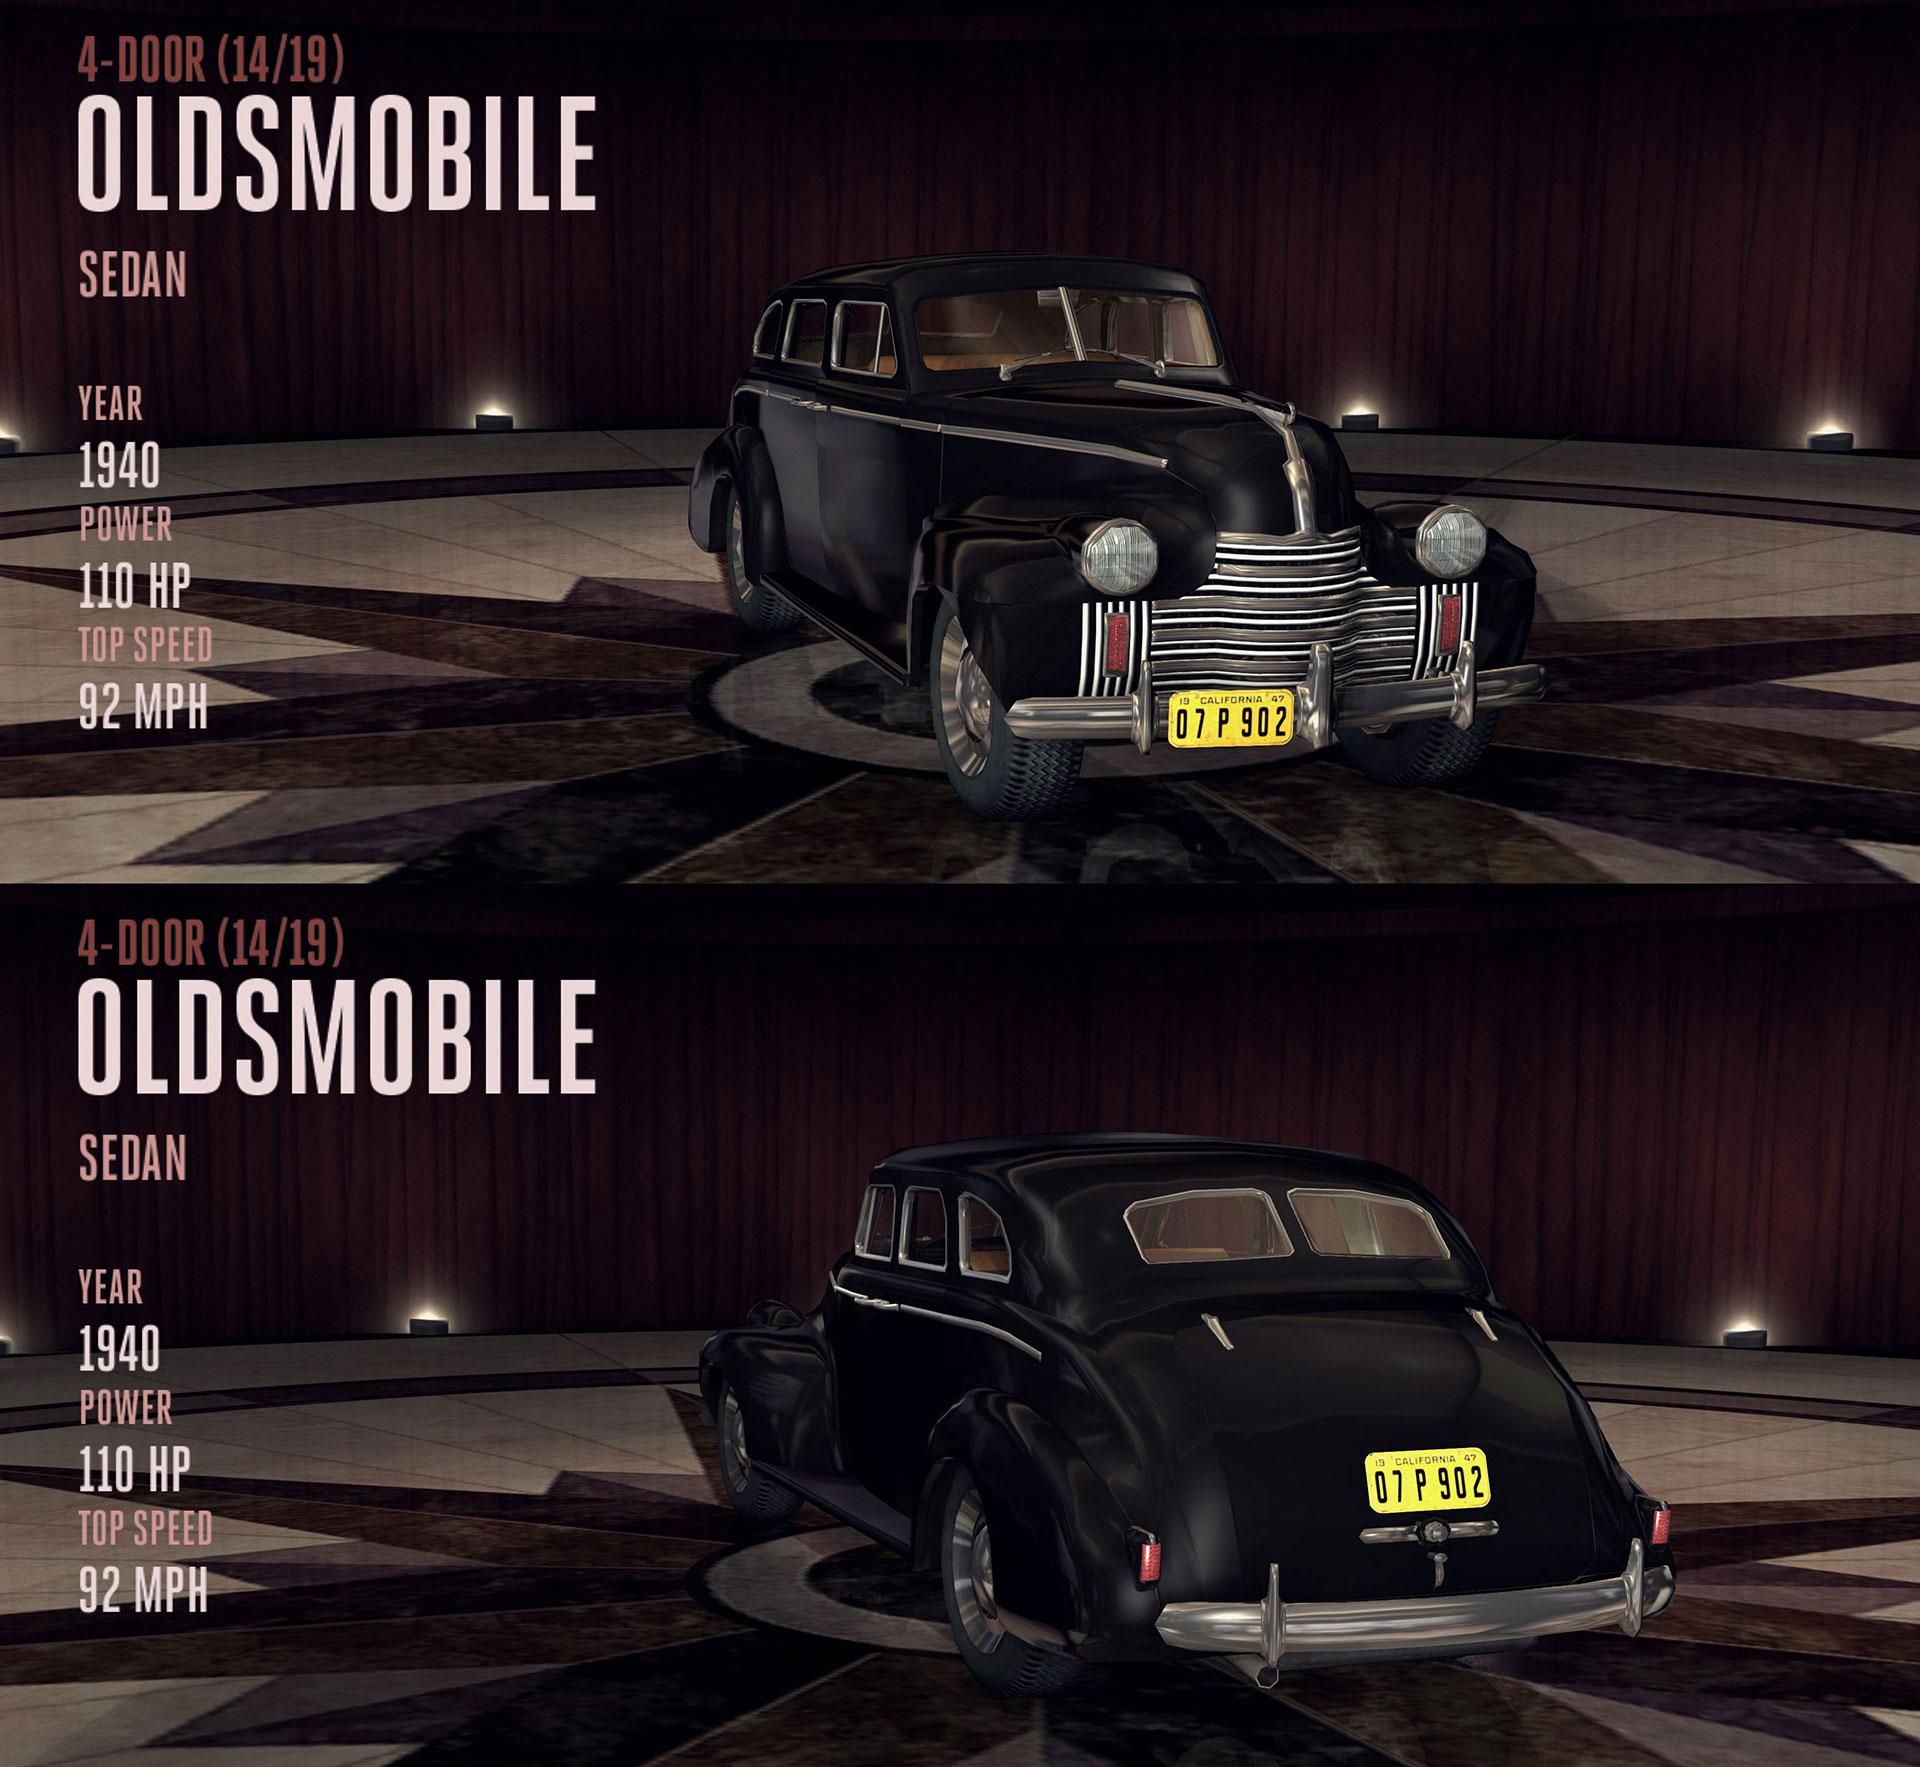 Oldsmobile Sedan